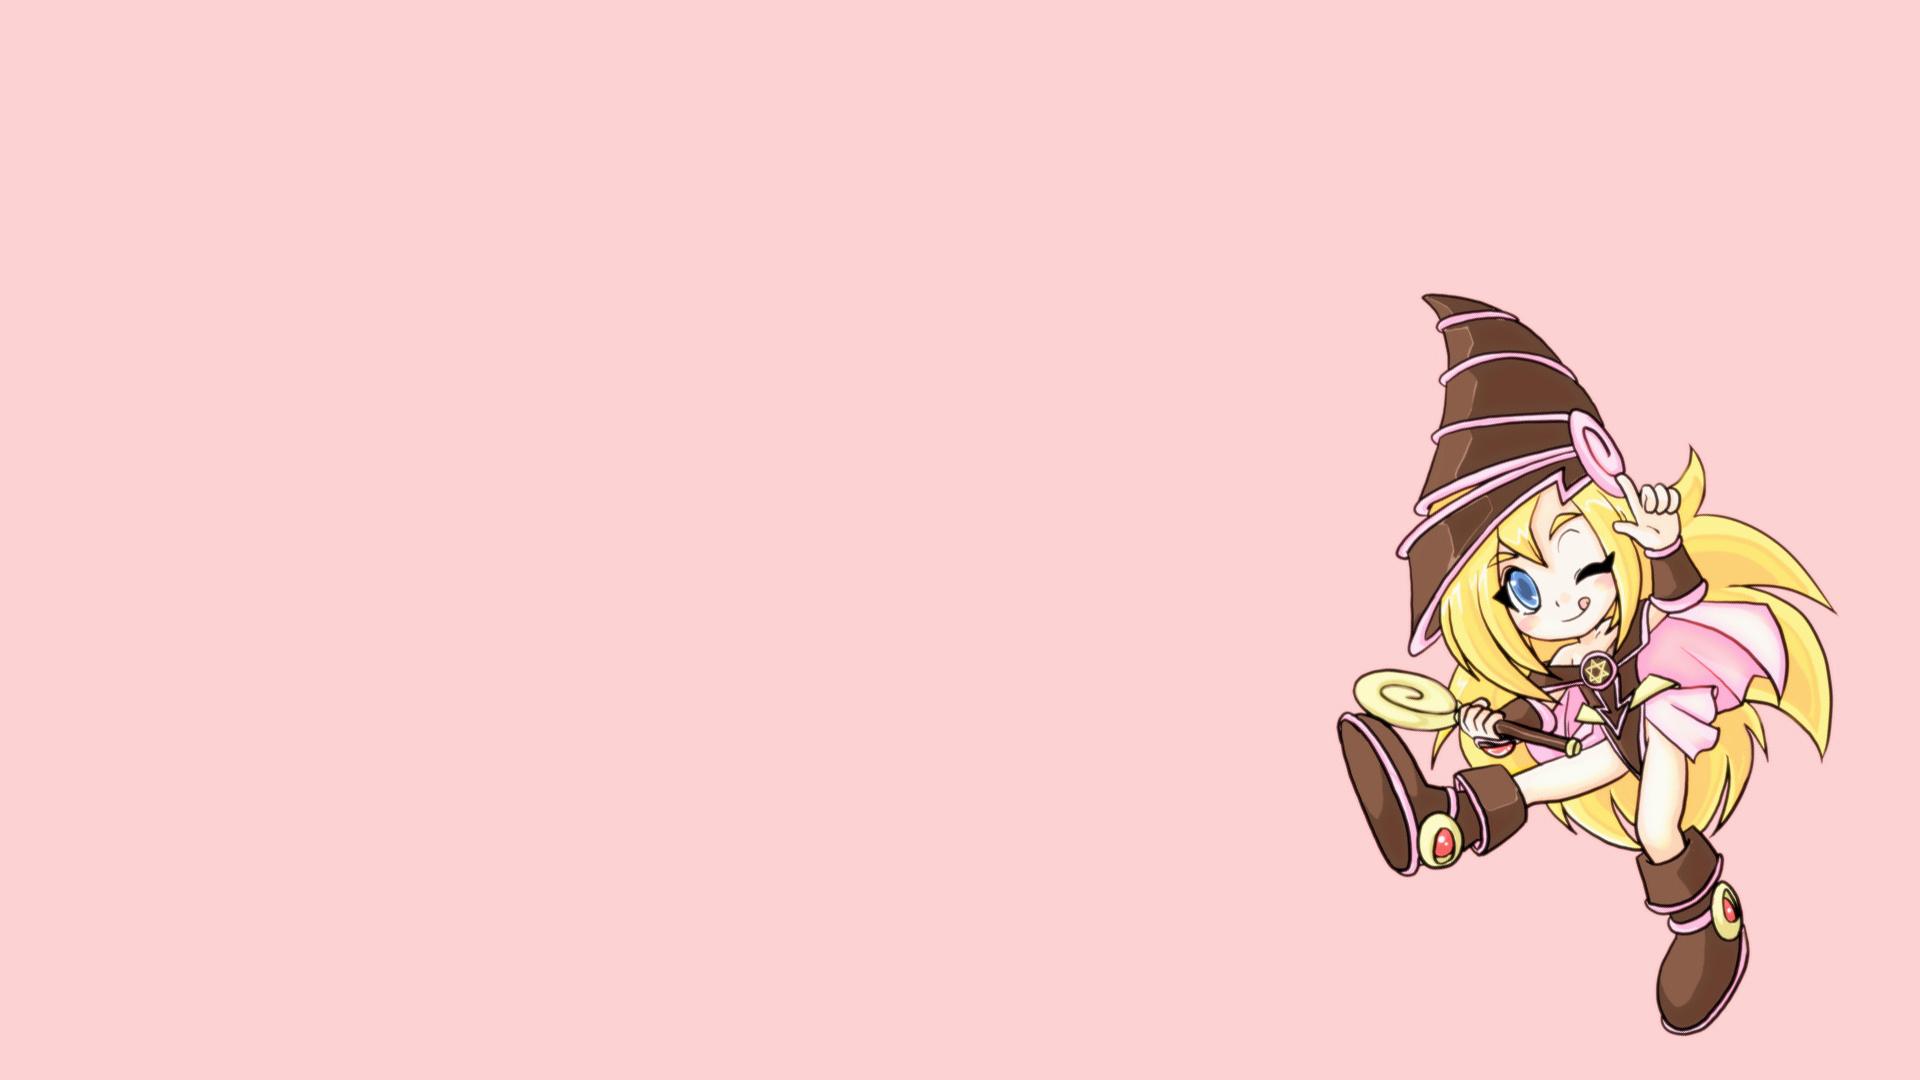 Dark Magician Girl Hd Wallpaper Background Image 1920x1080